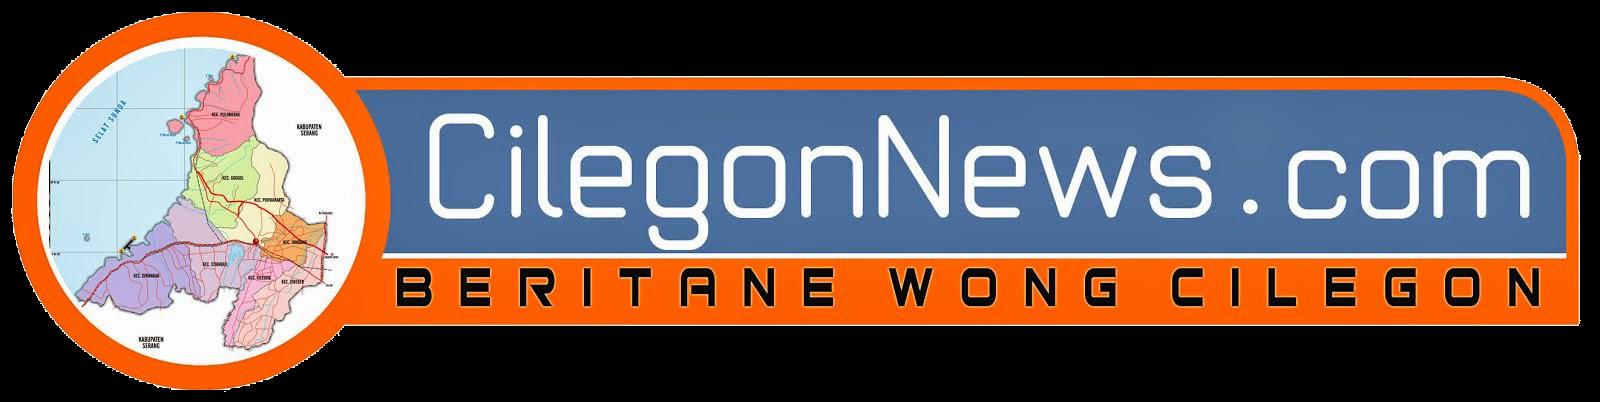 Cilegonnews.com :: Beritane Wong Cilegon